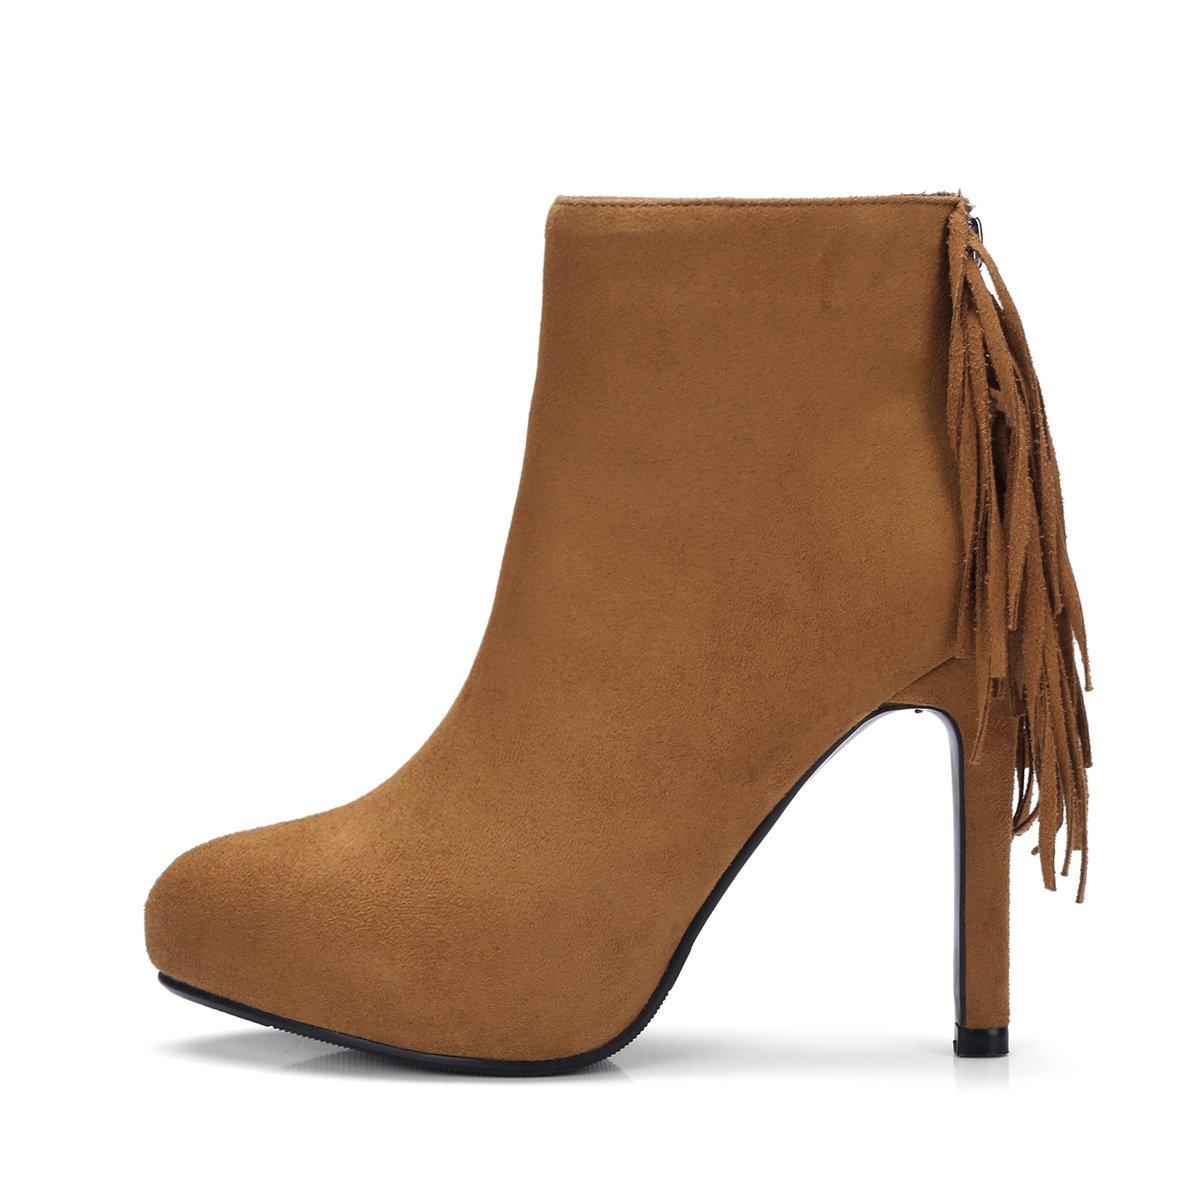 DYF Frauen Schuhe Kurze Stiefel Hellbraun, Fein Ferse Runden Kopf Gesäumt Farbe, Hellbraun, Stiefel 41 - 871920